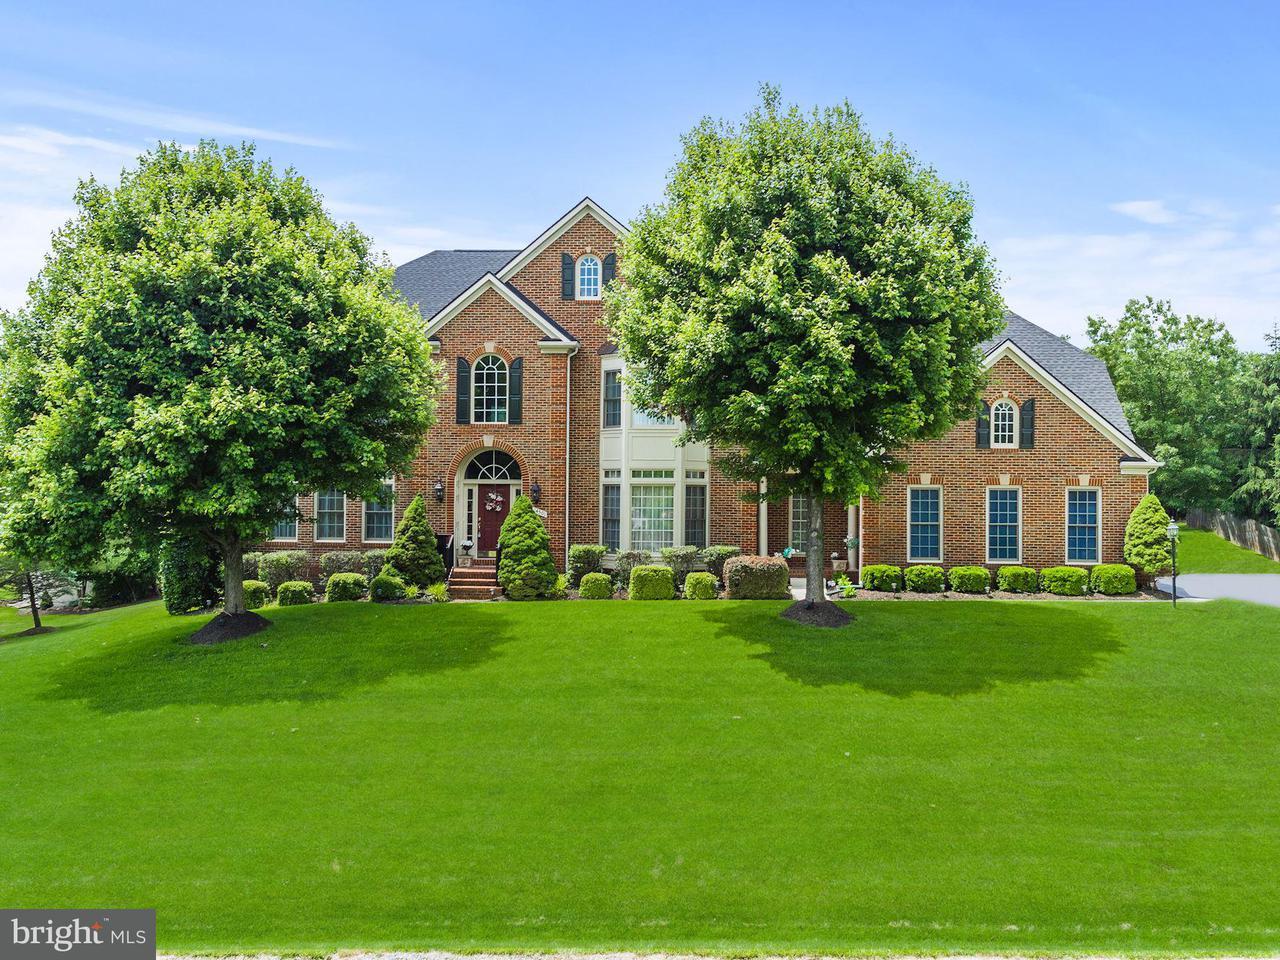 Single Family Home for Sale at 14501 AKKER Court 14501 AKKER Court Gainesville, Virginia 20155 United States